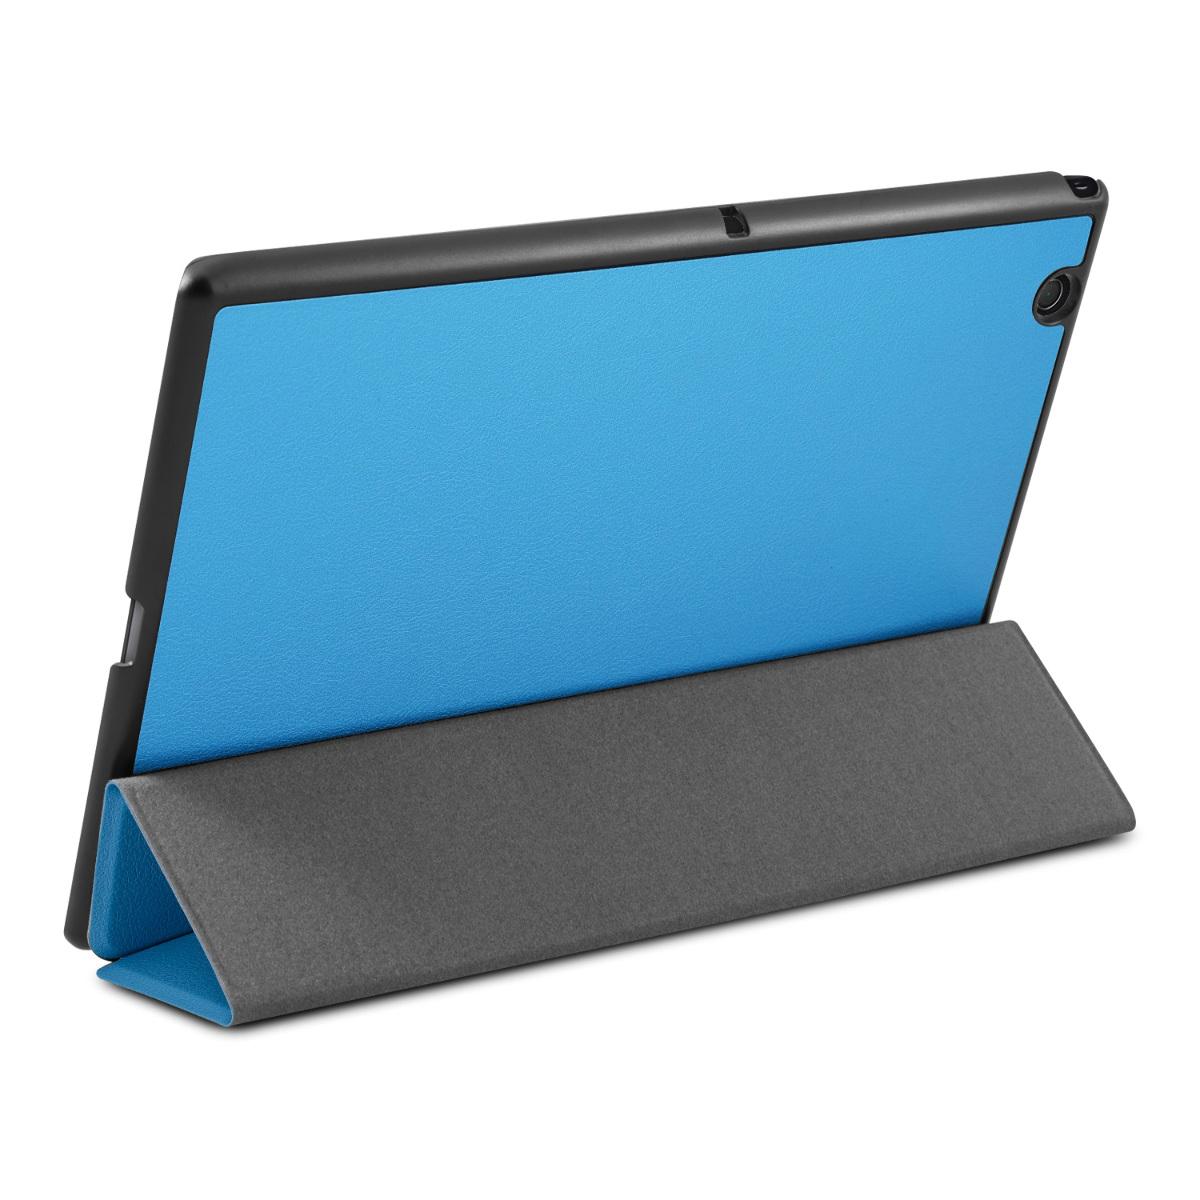 Funda para sony xperia tablet z4 azul claro carcasa protectora estuche m vil ebay - Funda xperia z tablet ...